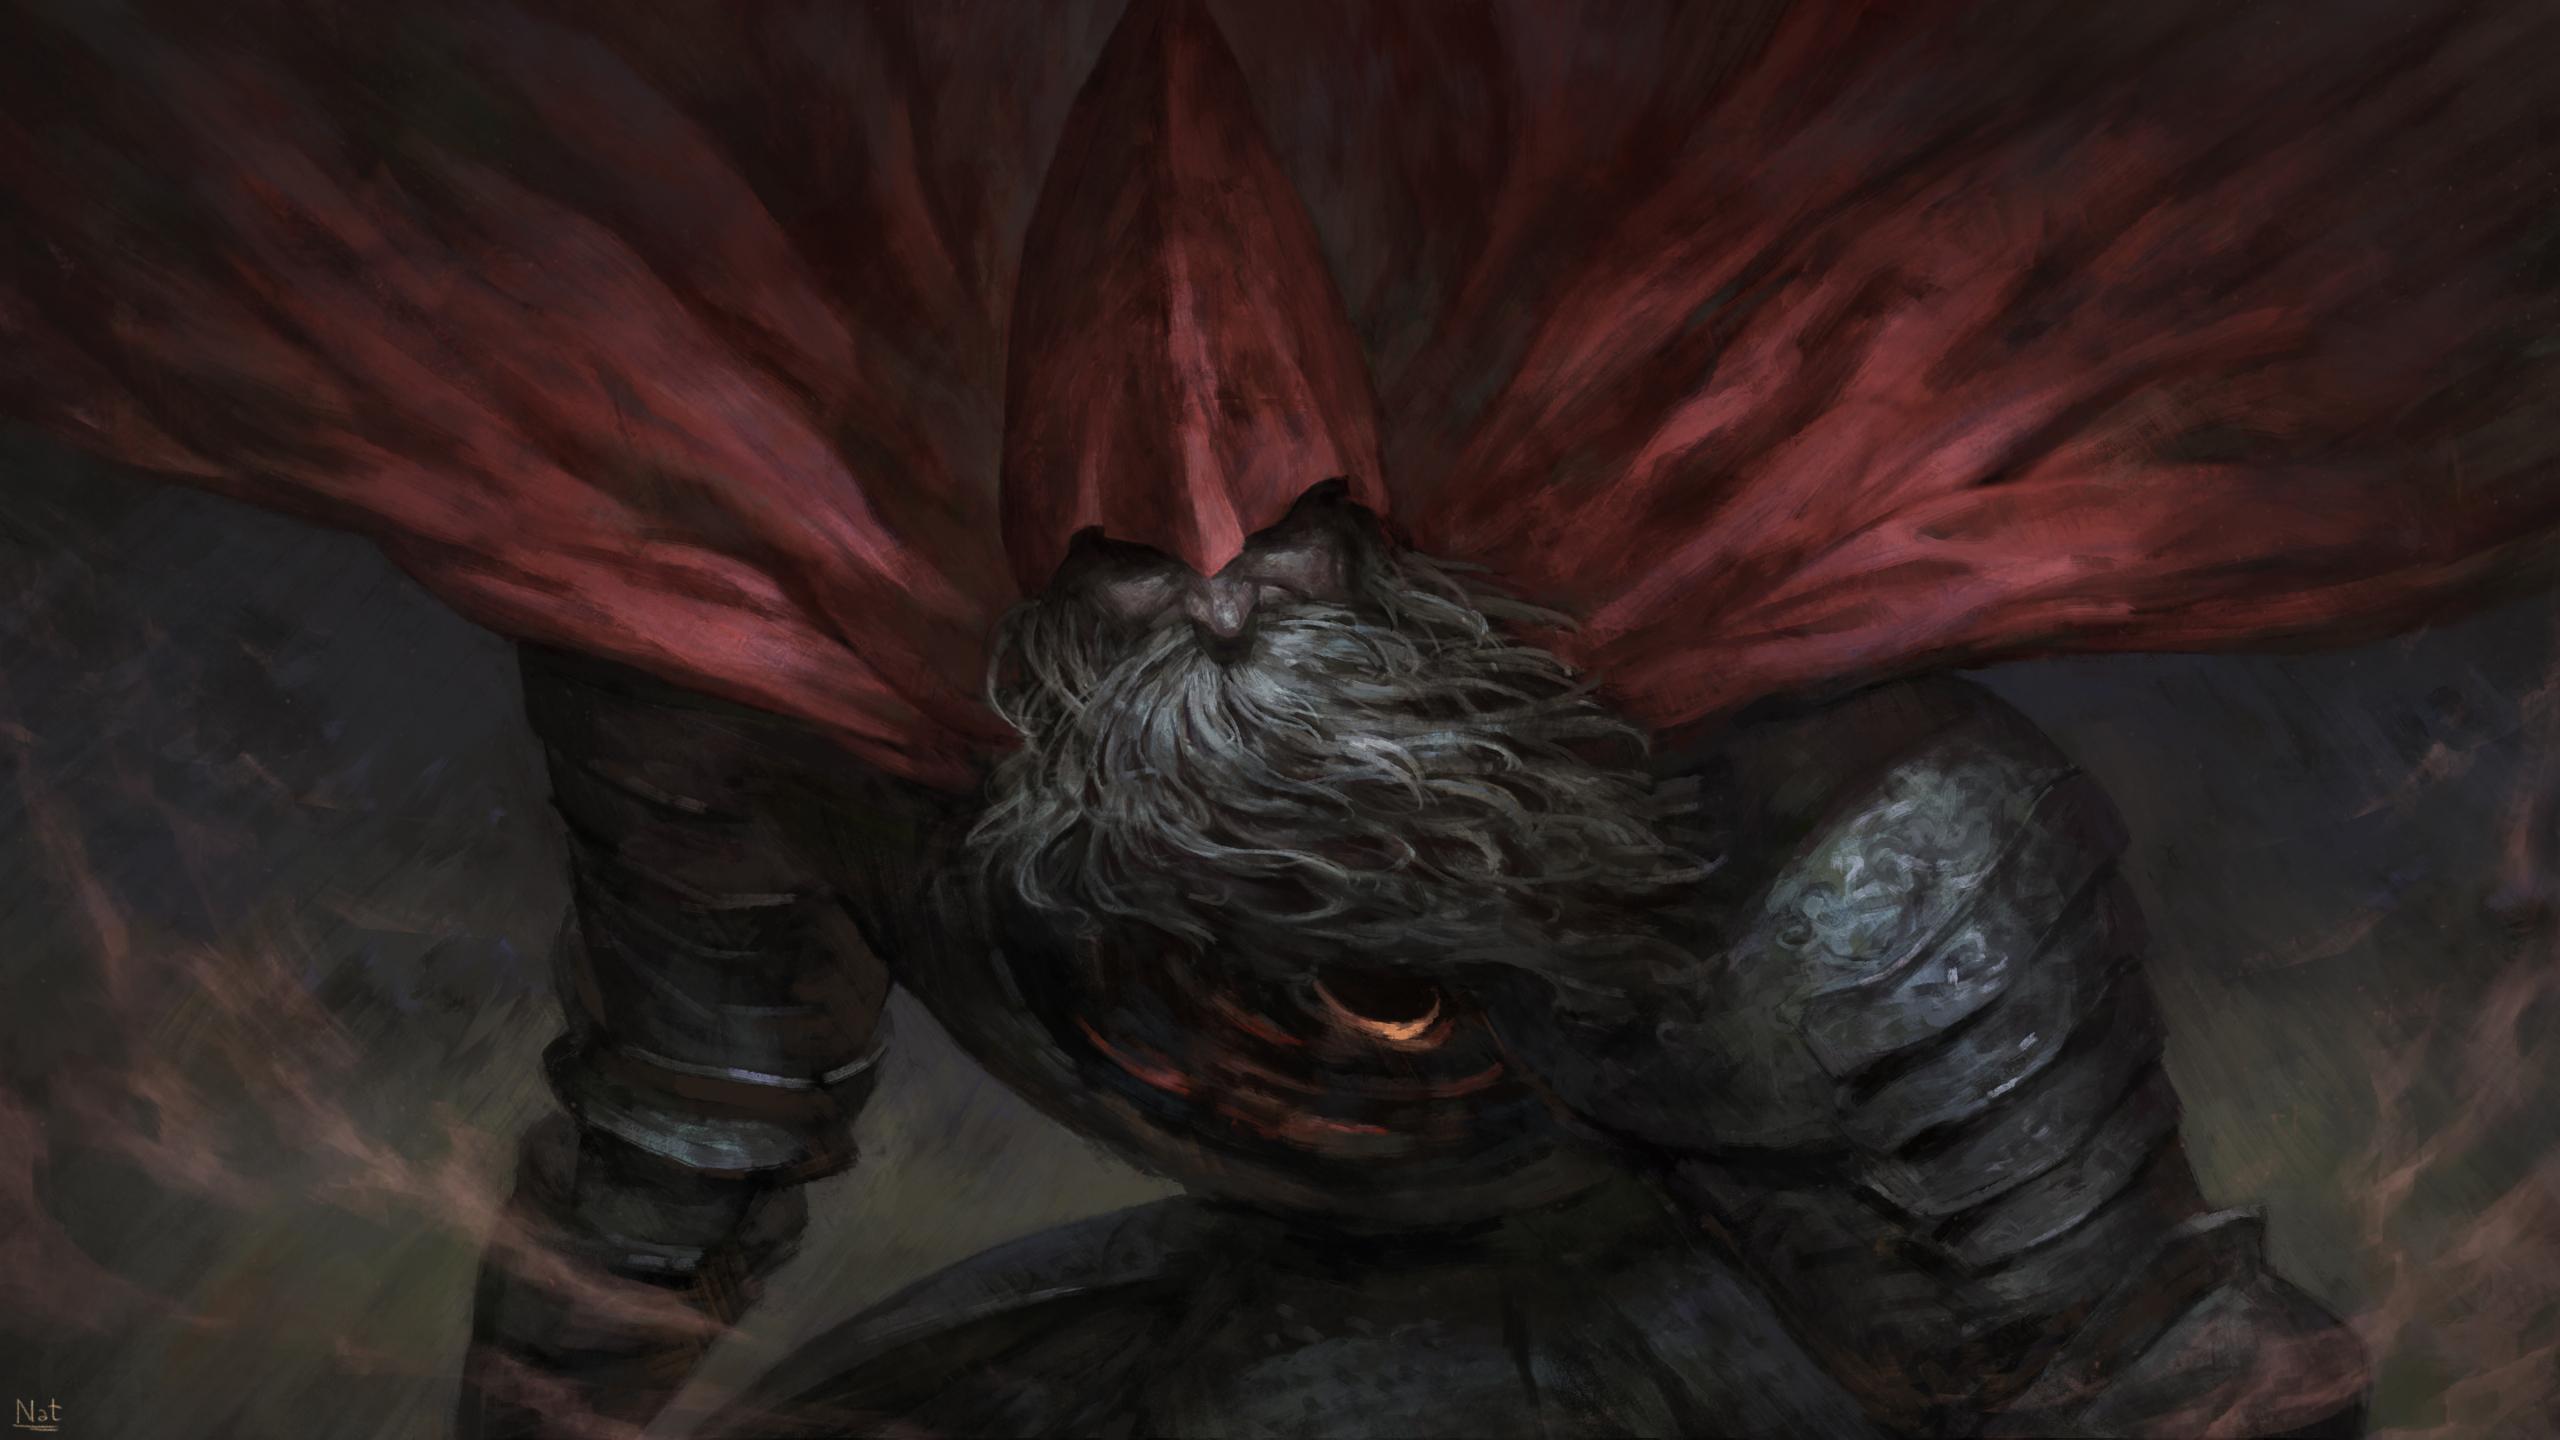 Dark Souls 3 21 9: Download 2560x1440 Wallpaper Big Beard Man, Warrior, Dark